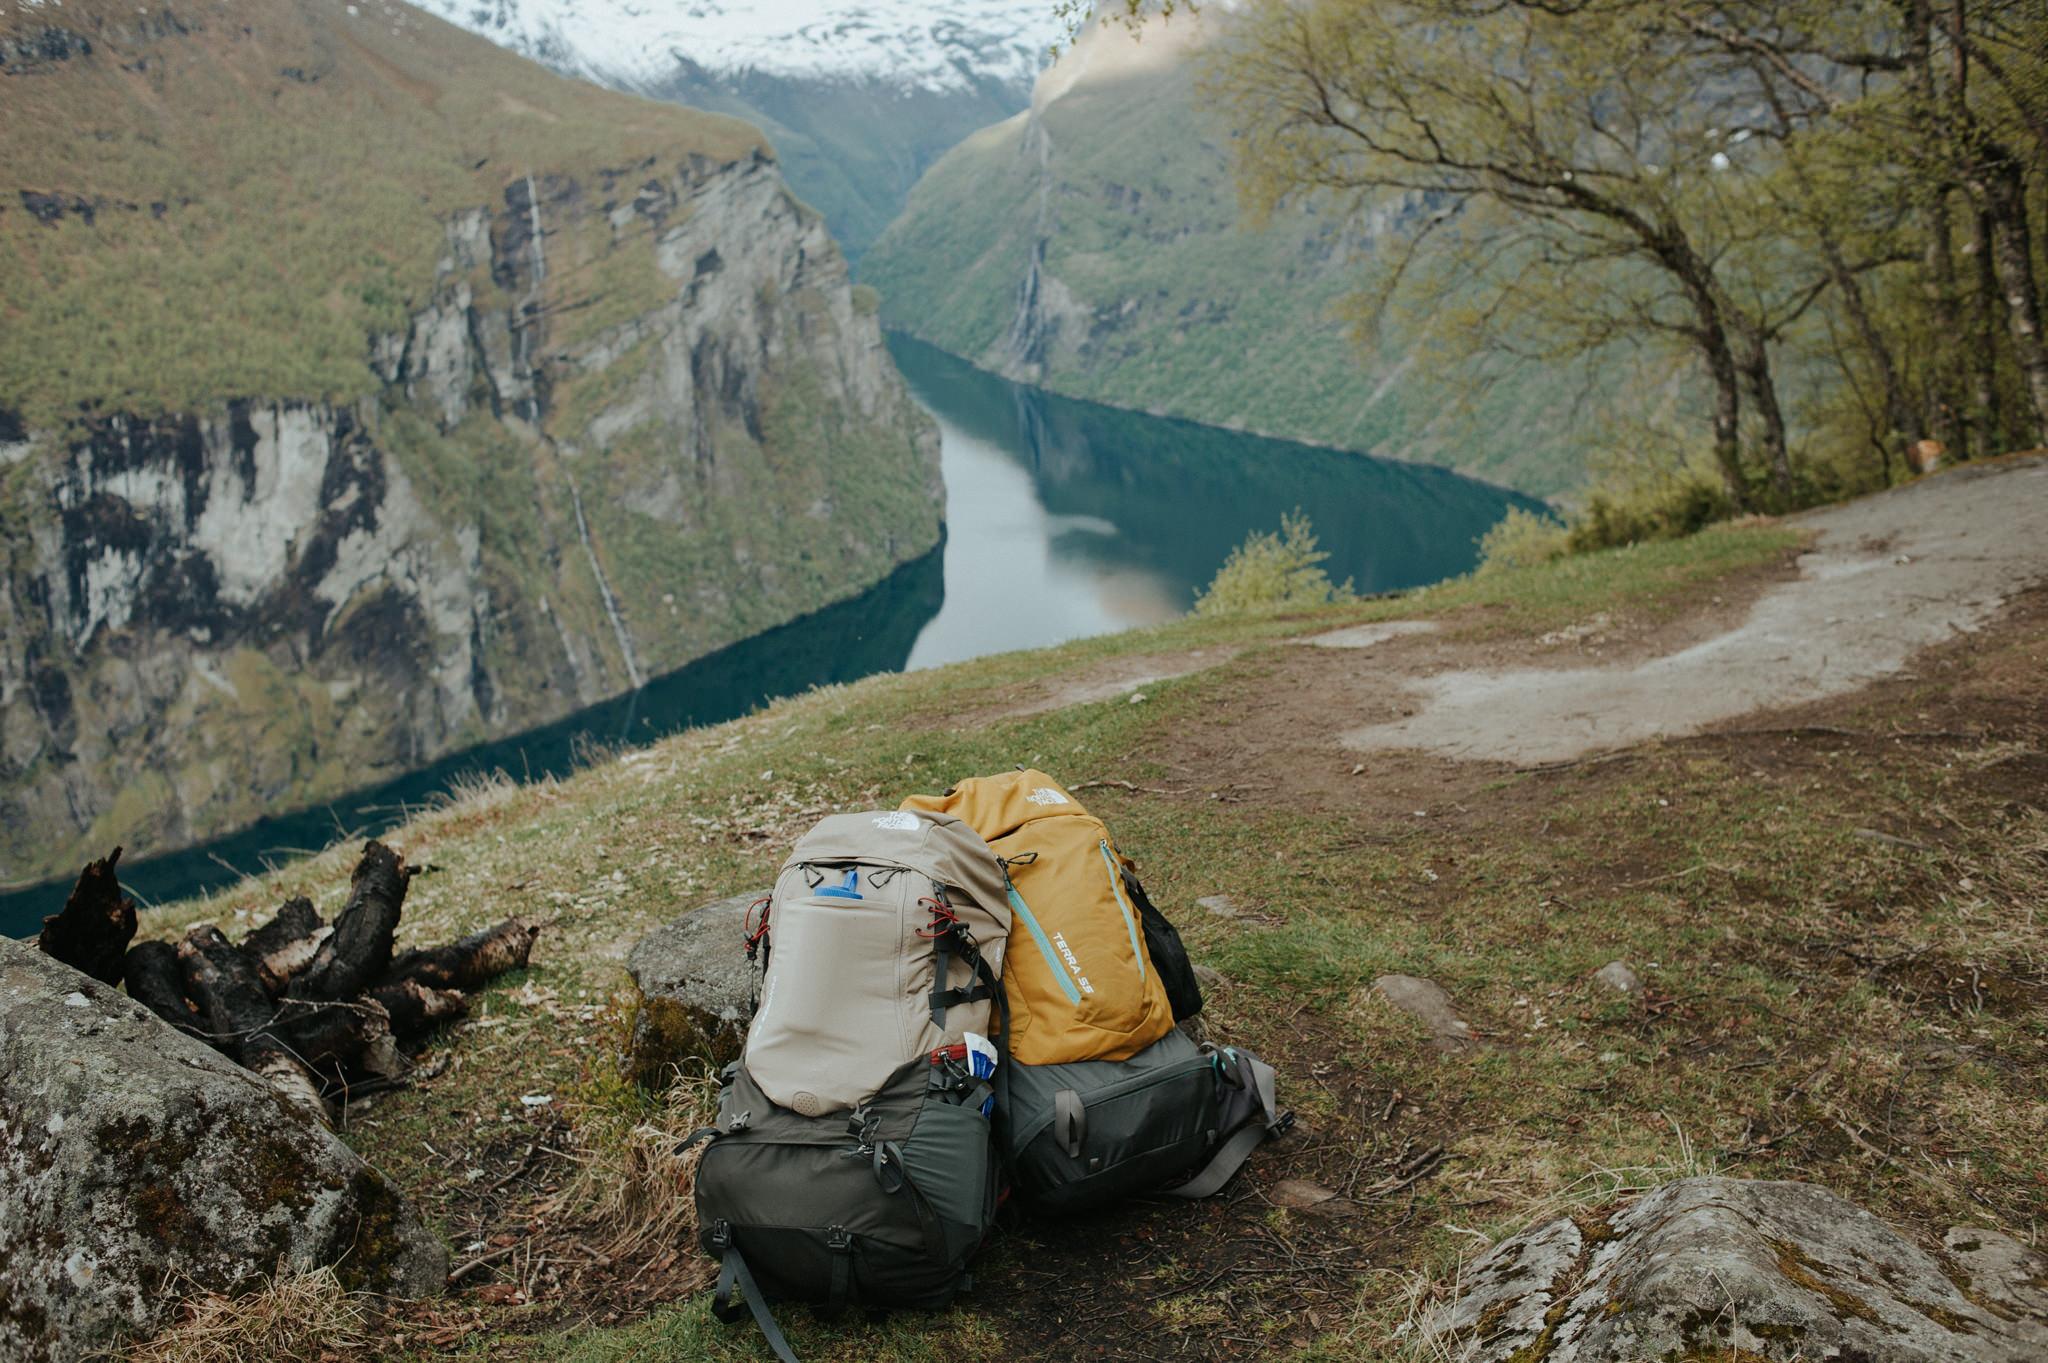 Camping in Geirangerfjord, Norway // Daring Wanderer: www.daringwanderer.com